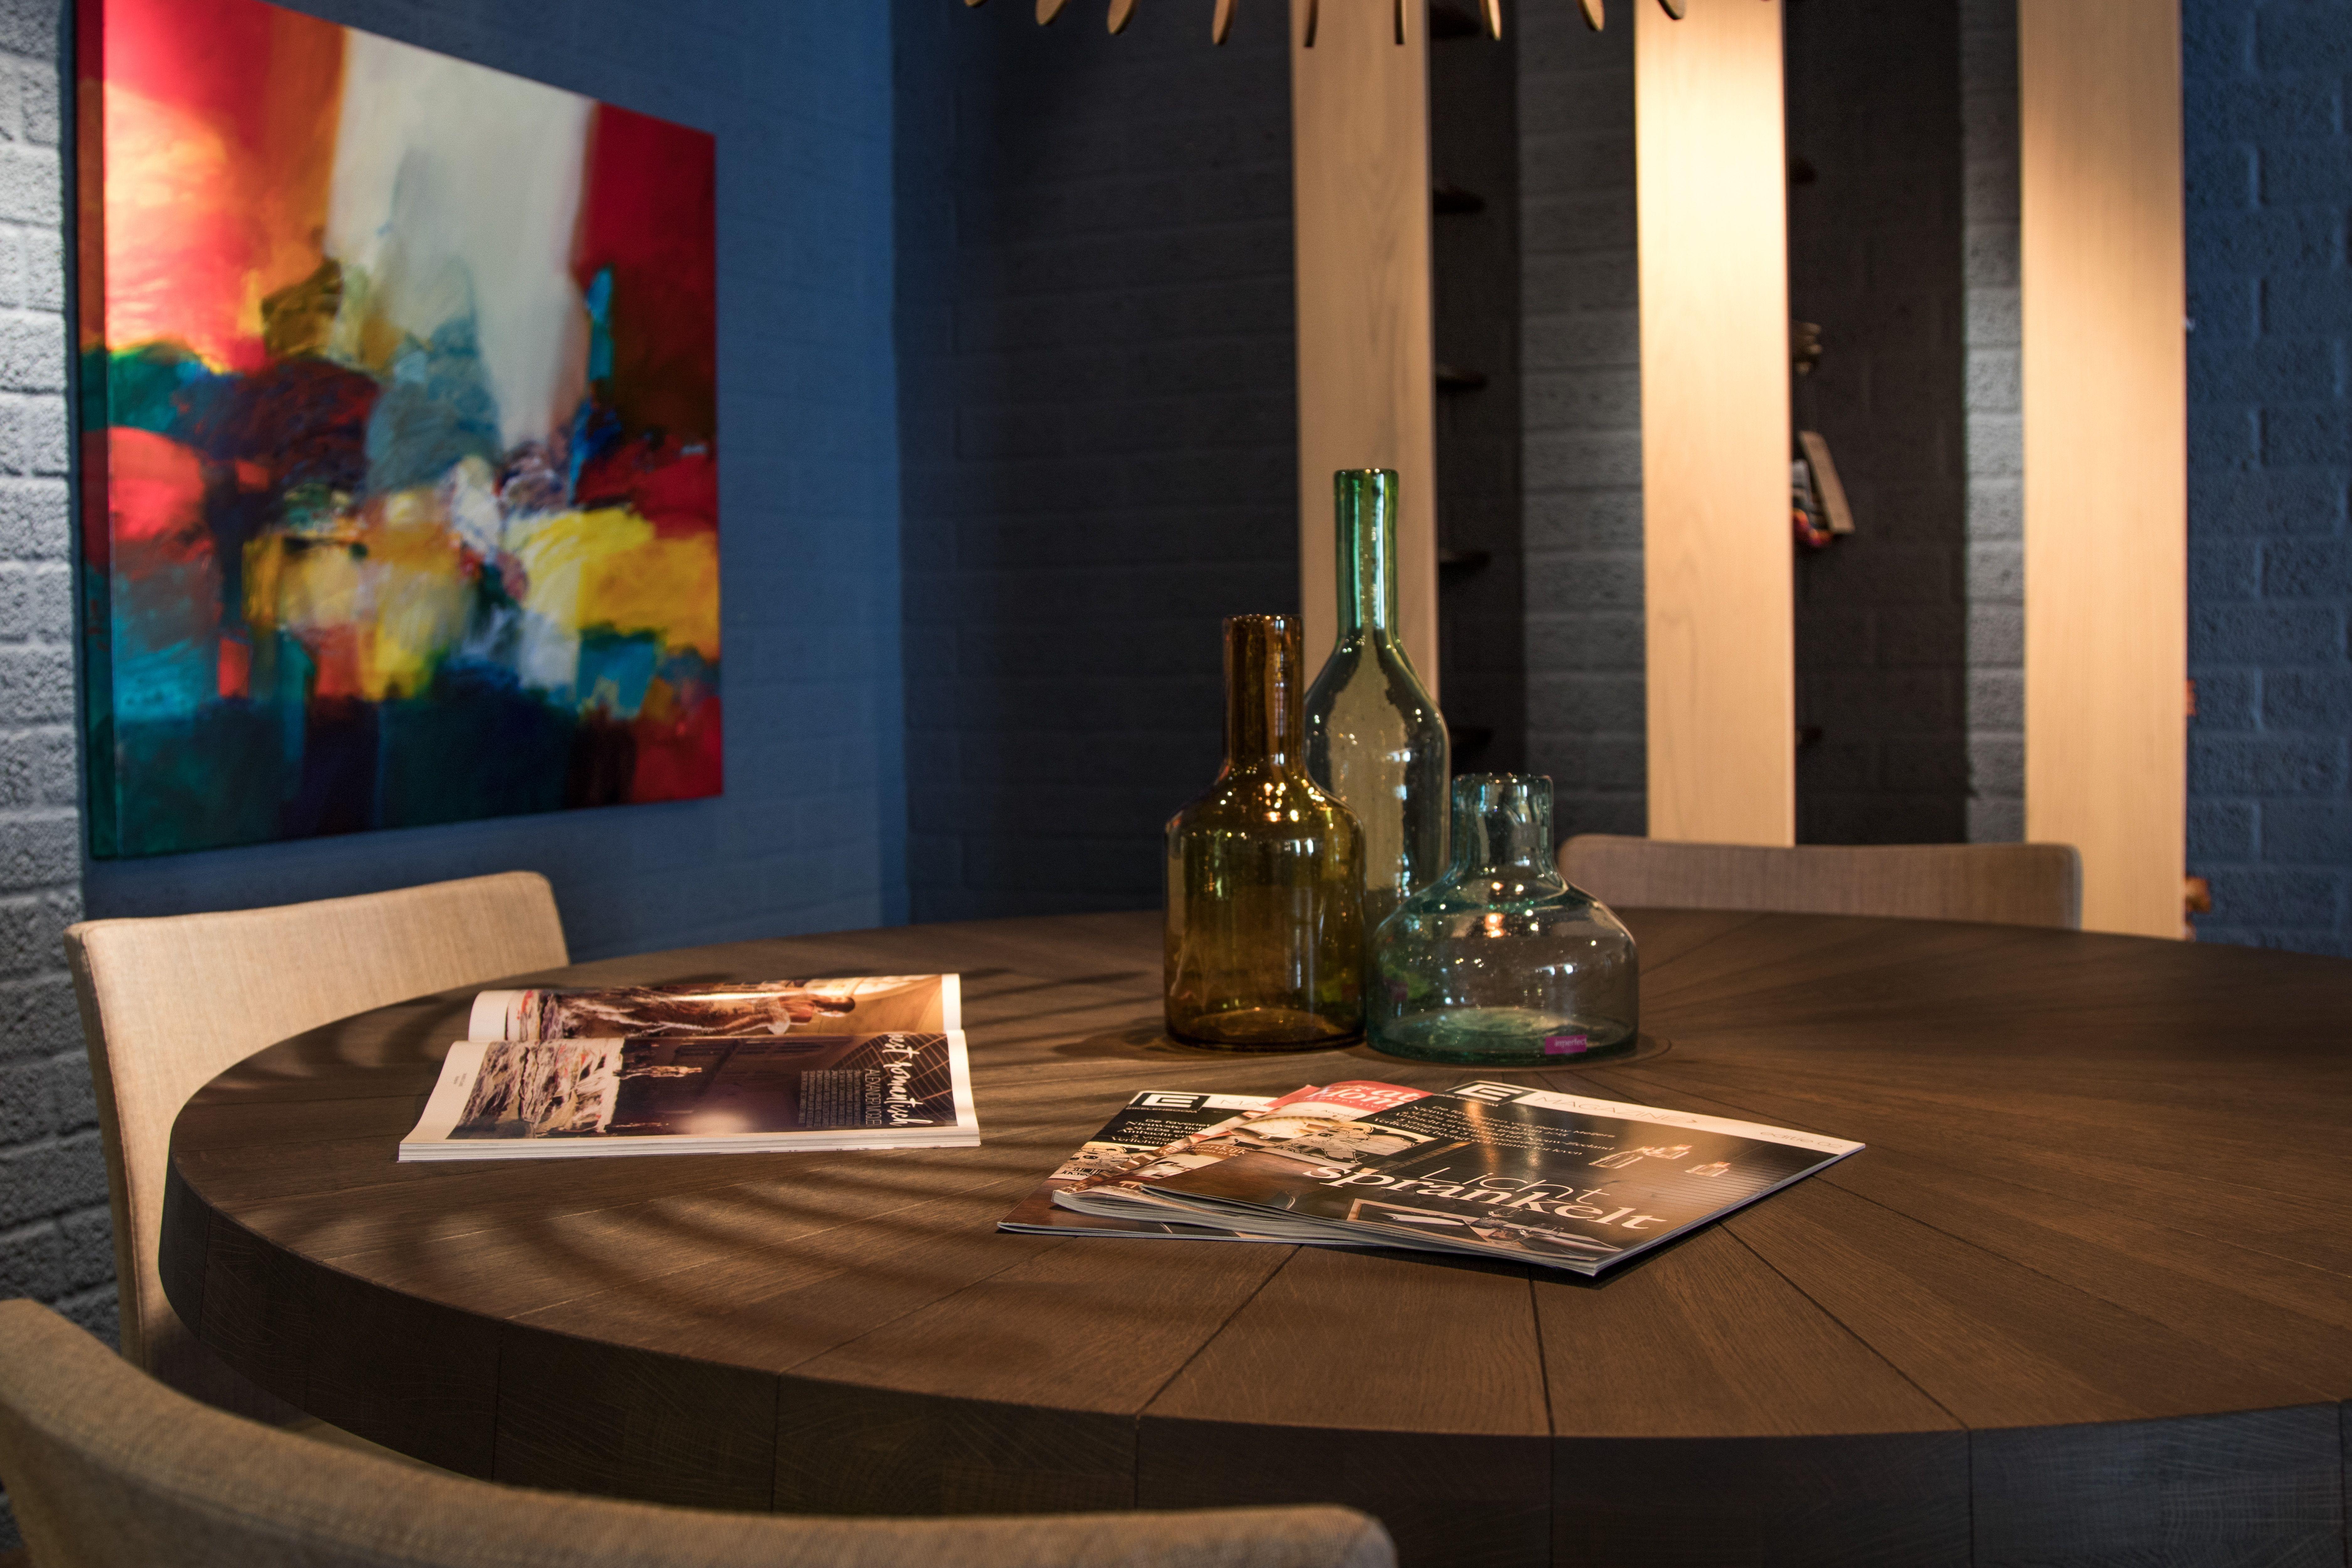 Design Meubels Arnhem : Design meubels arnhem beeldfotoalbum with design meubels arnhem